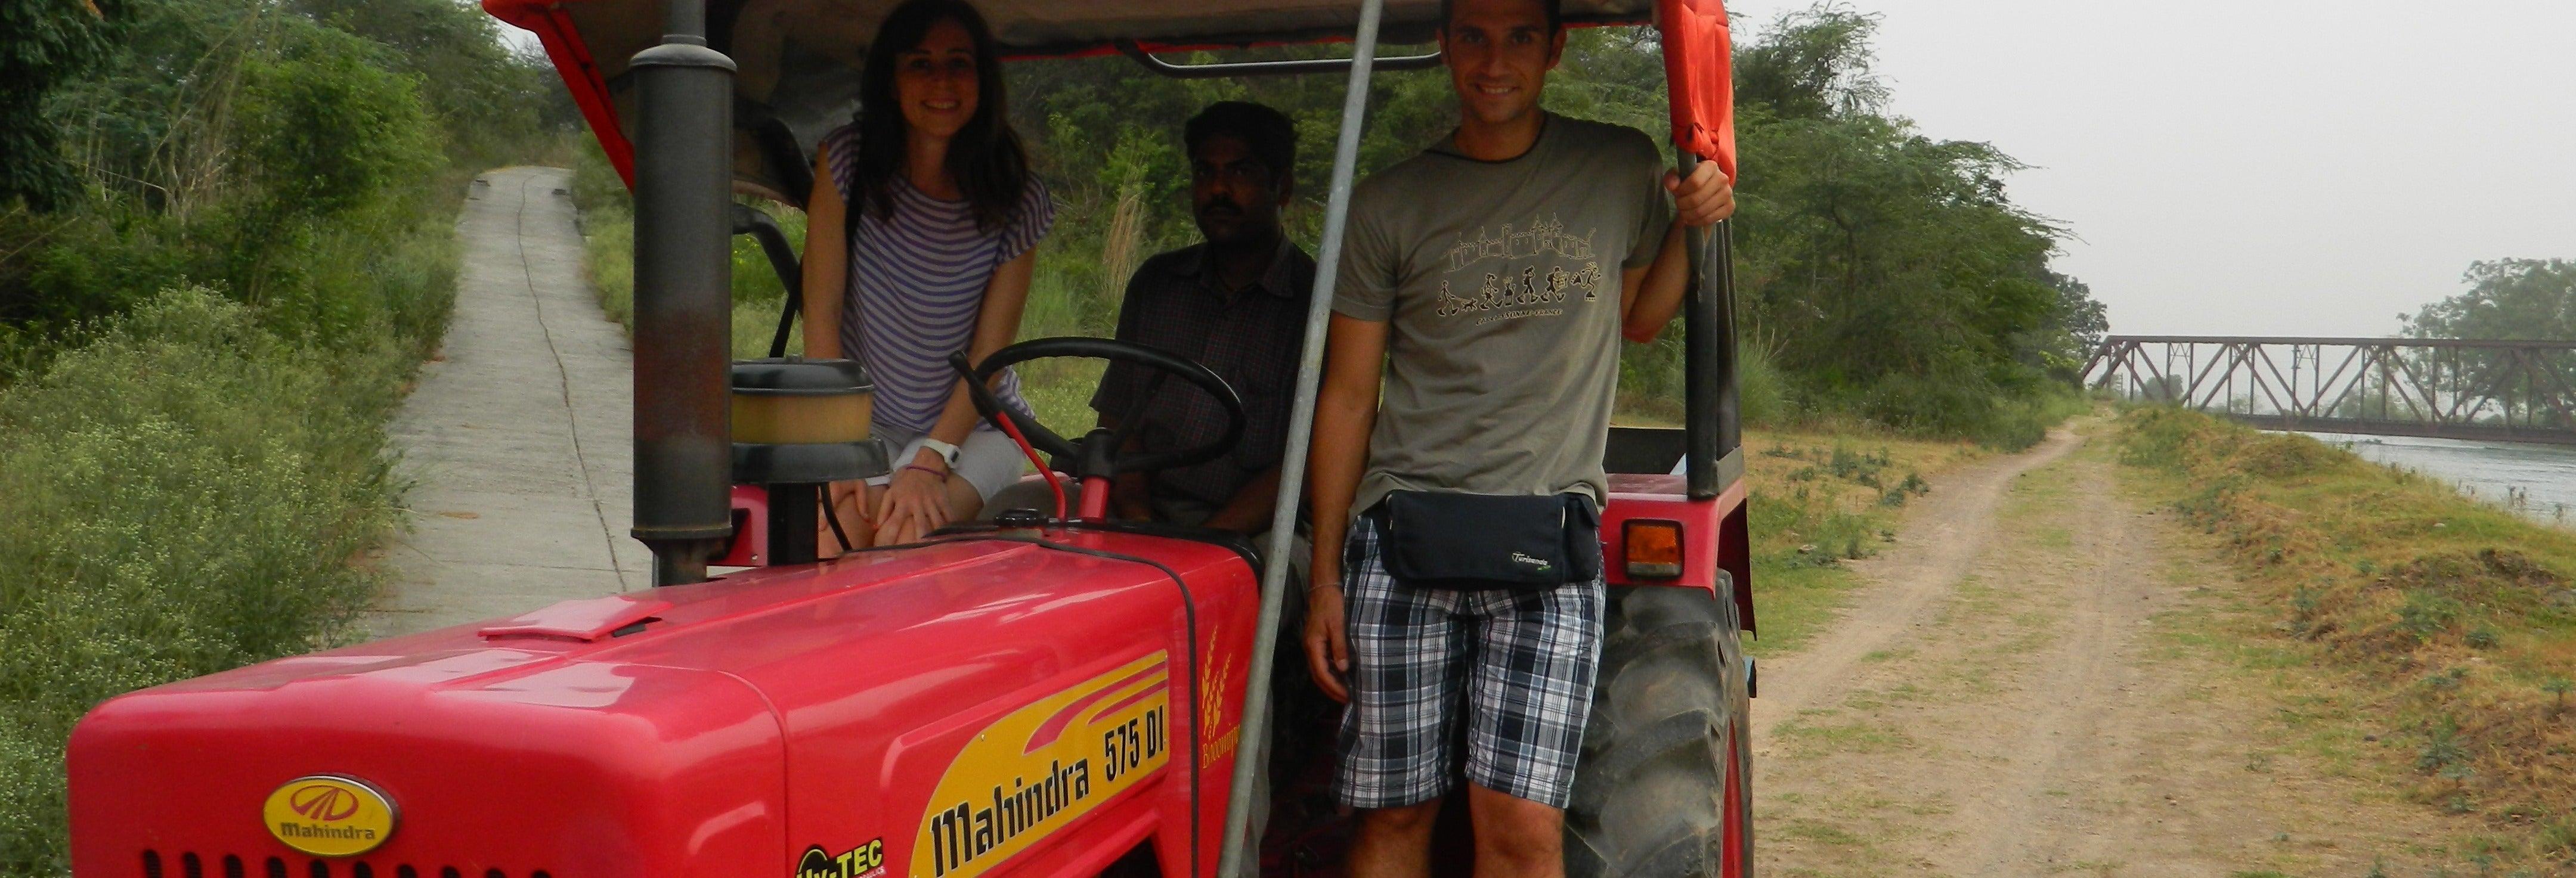 Balade en tracteur dans la campagne d'Agra